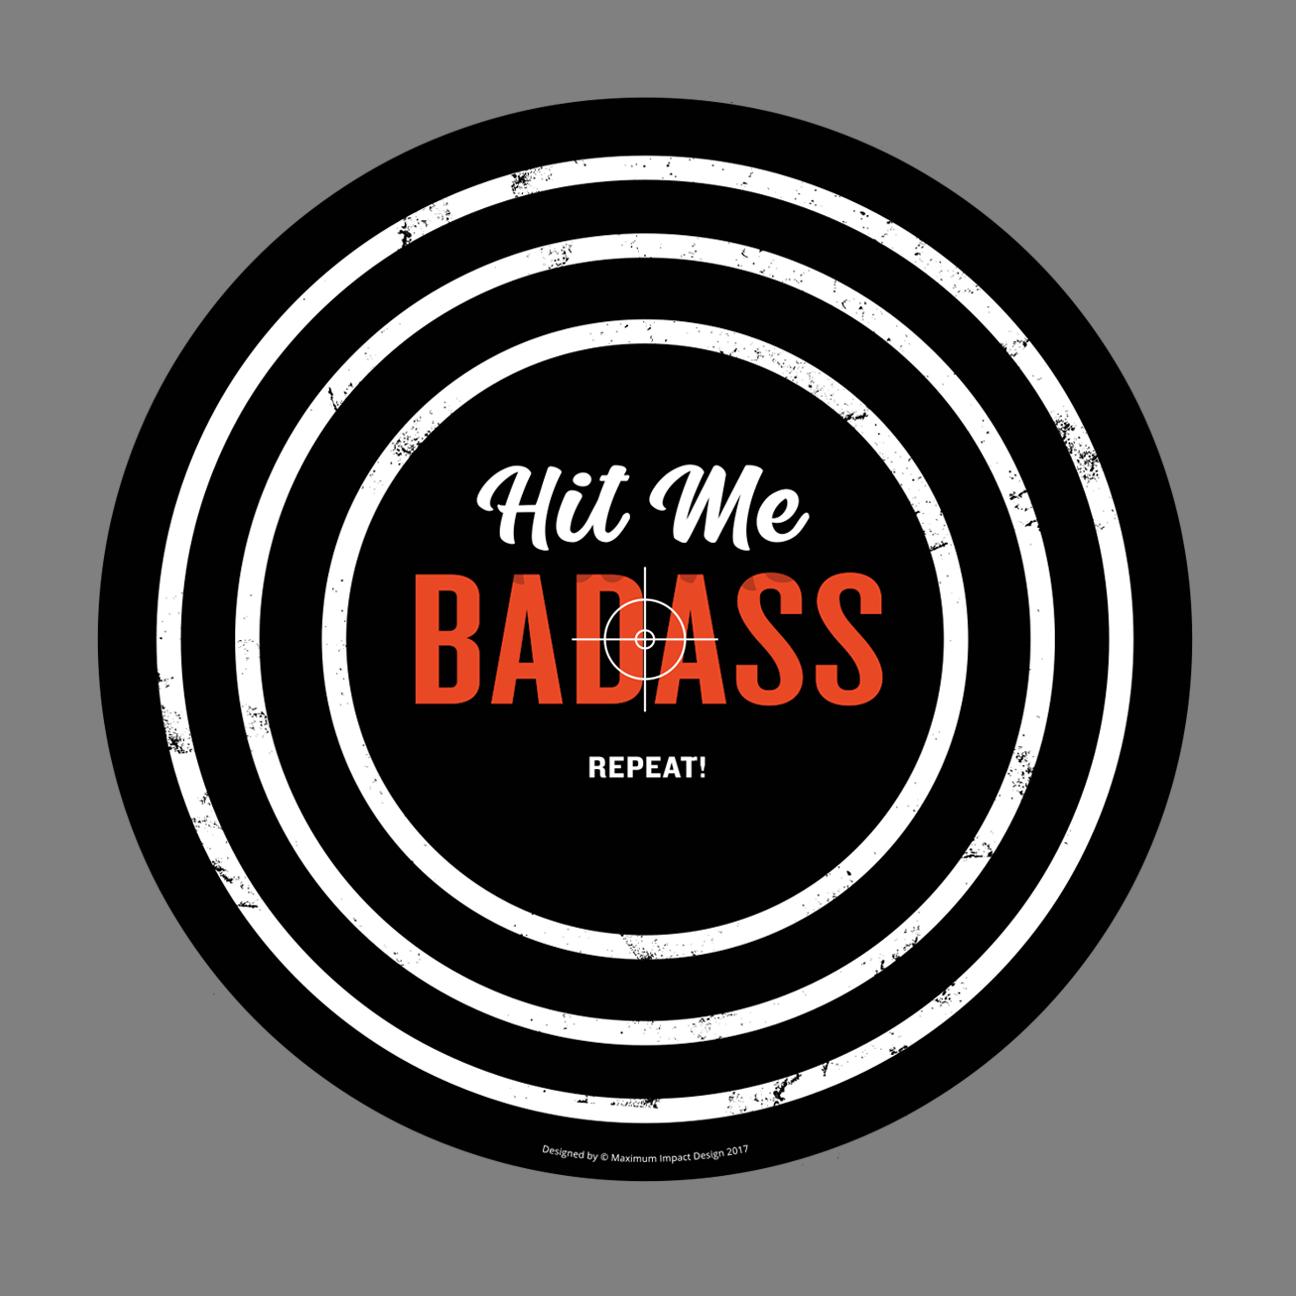 BASM target Badass